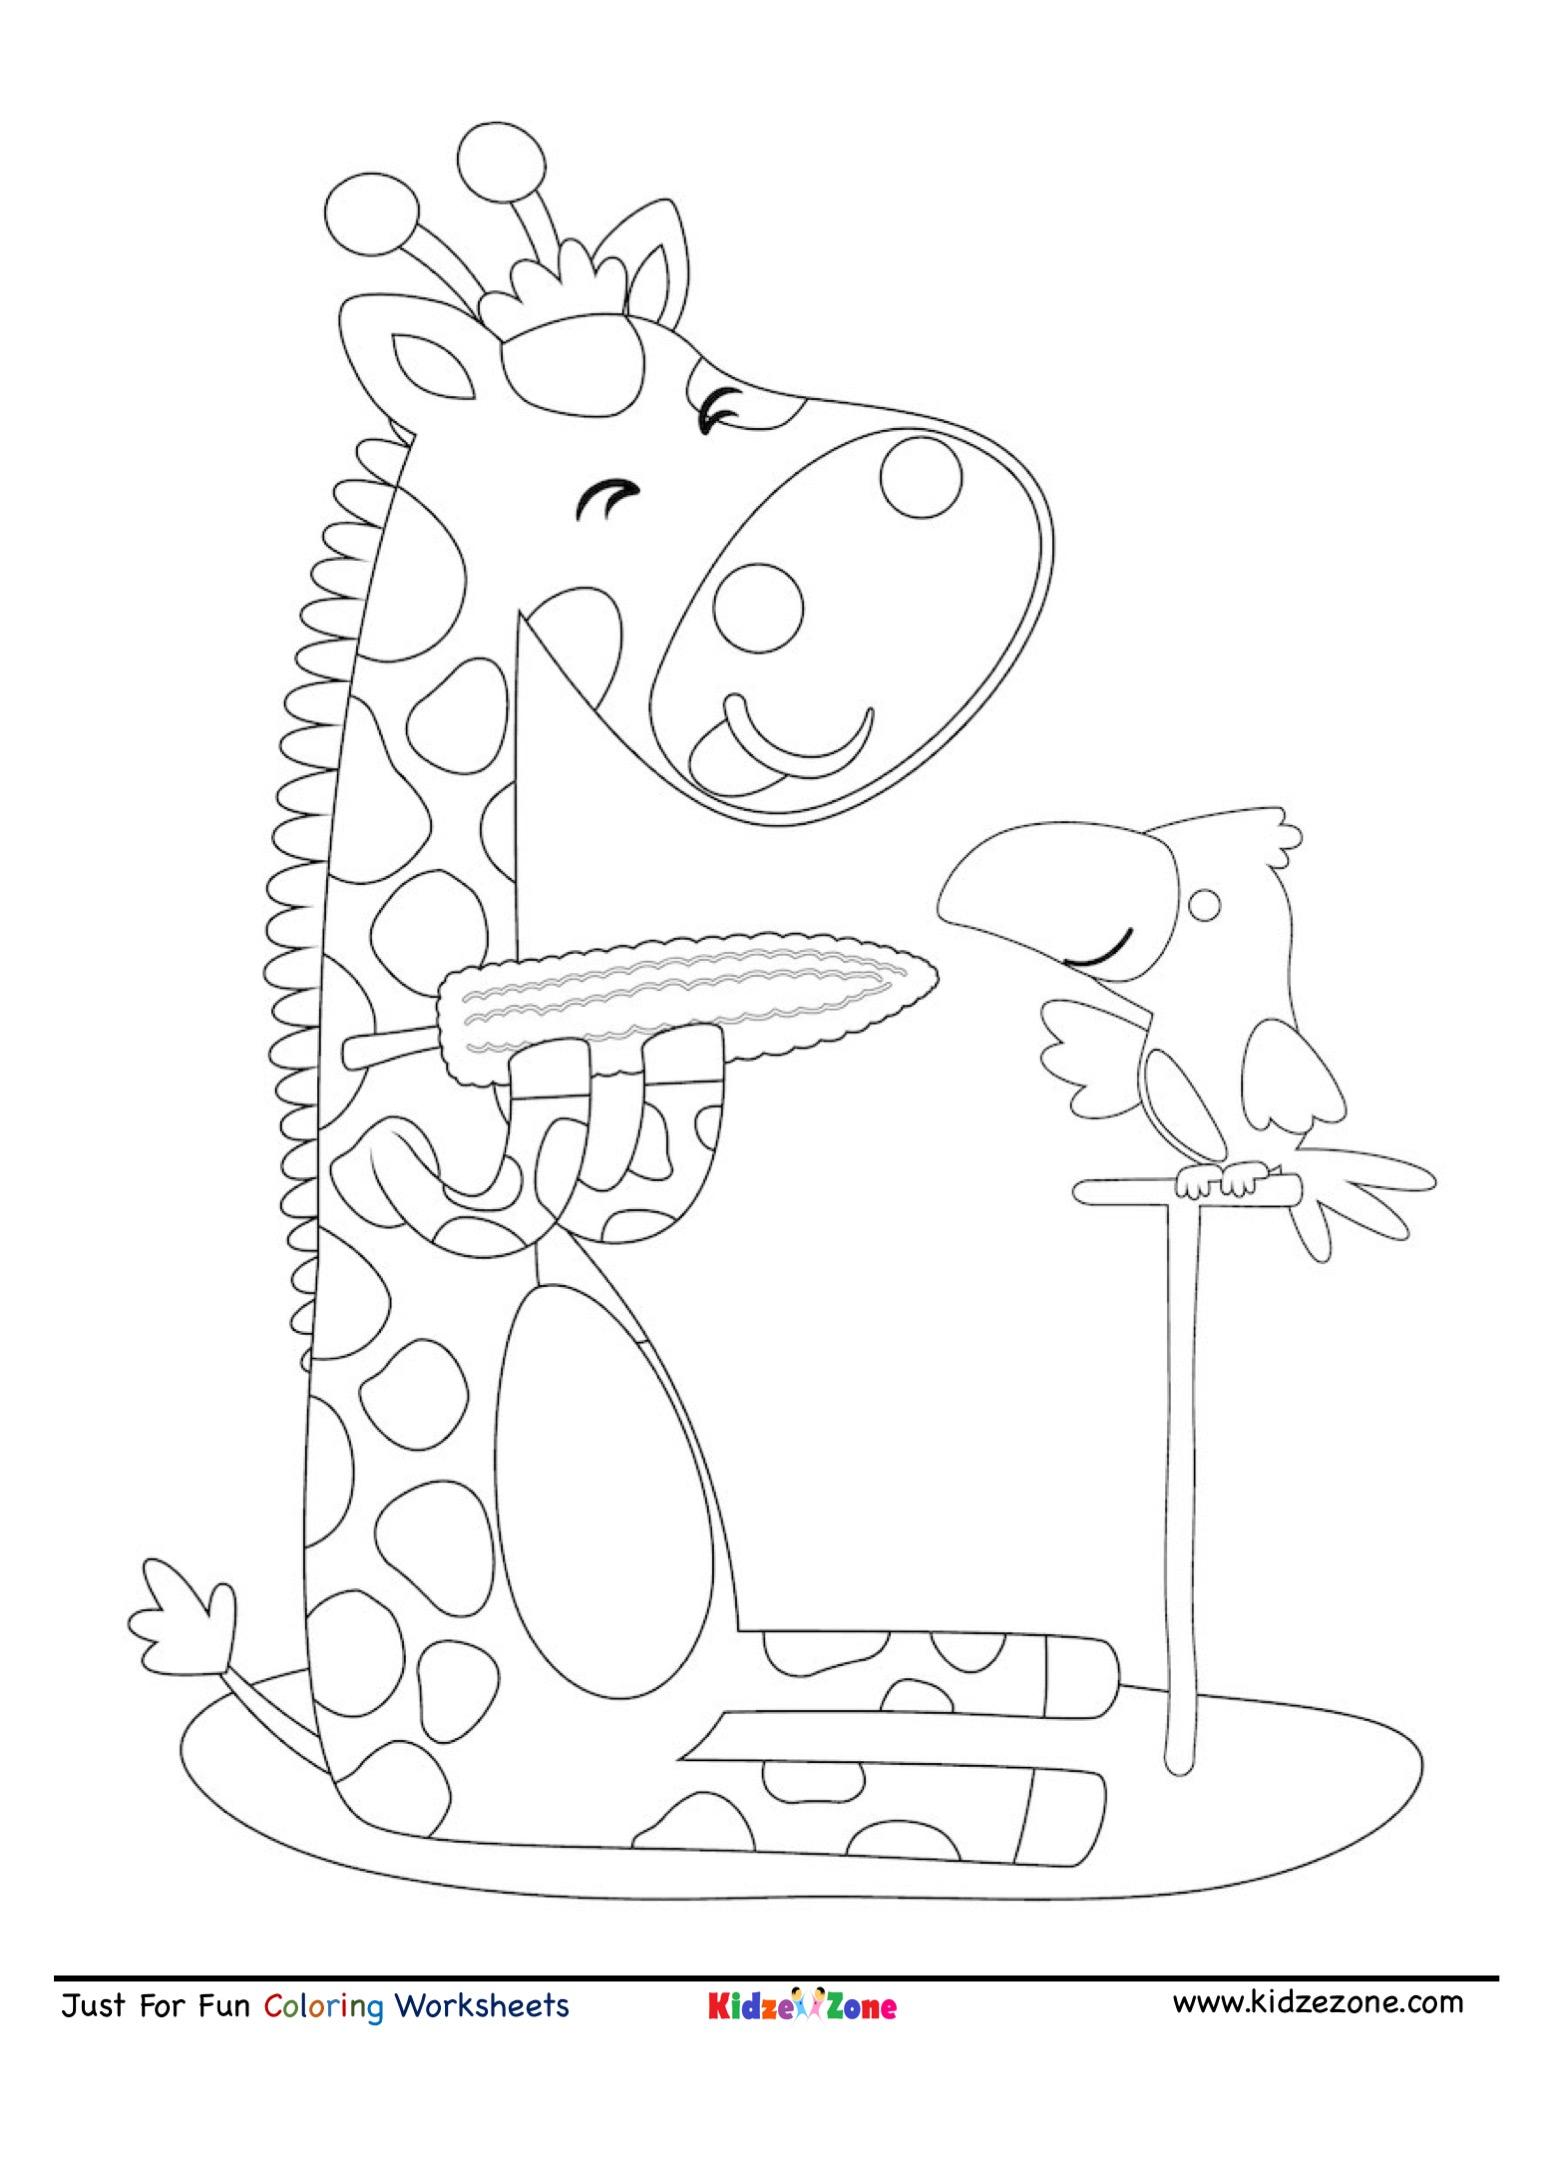 Giraffe Eating Corn Cartoon Coloring Page